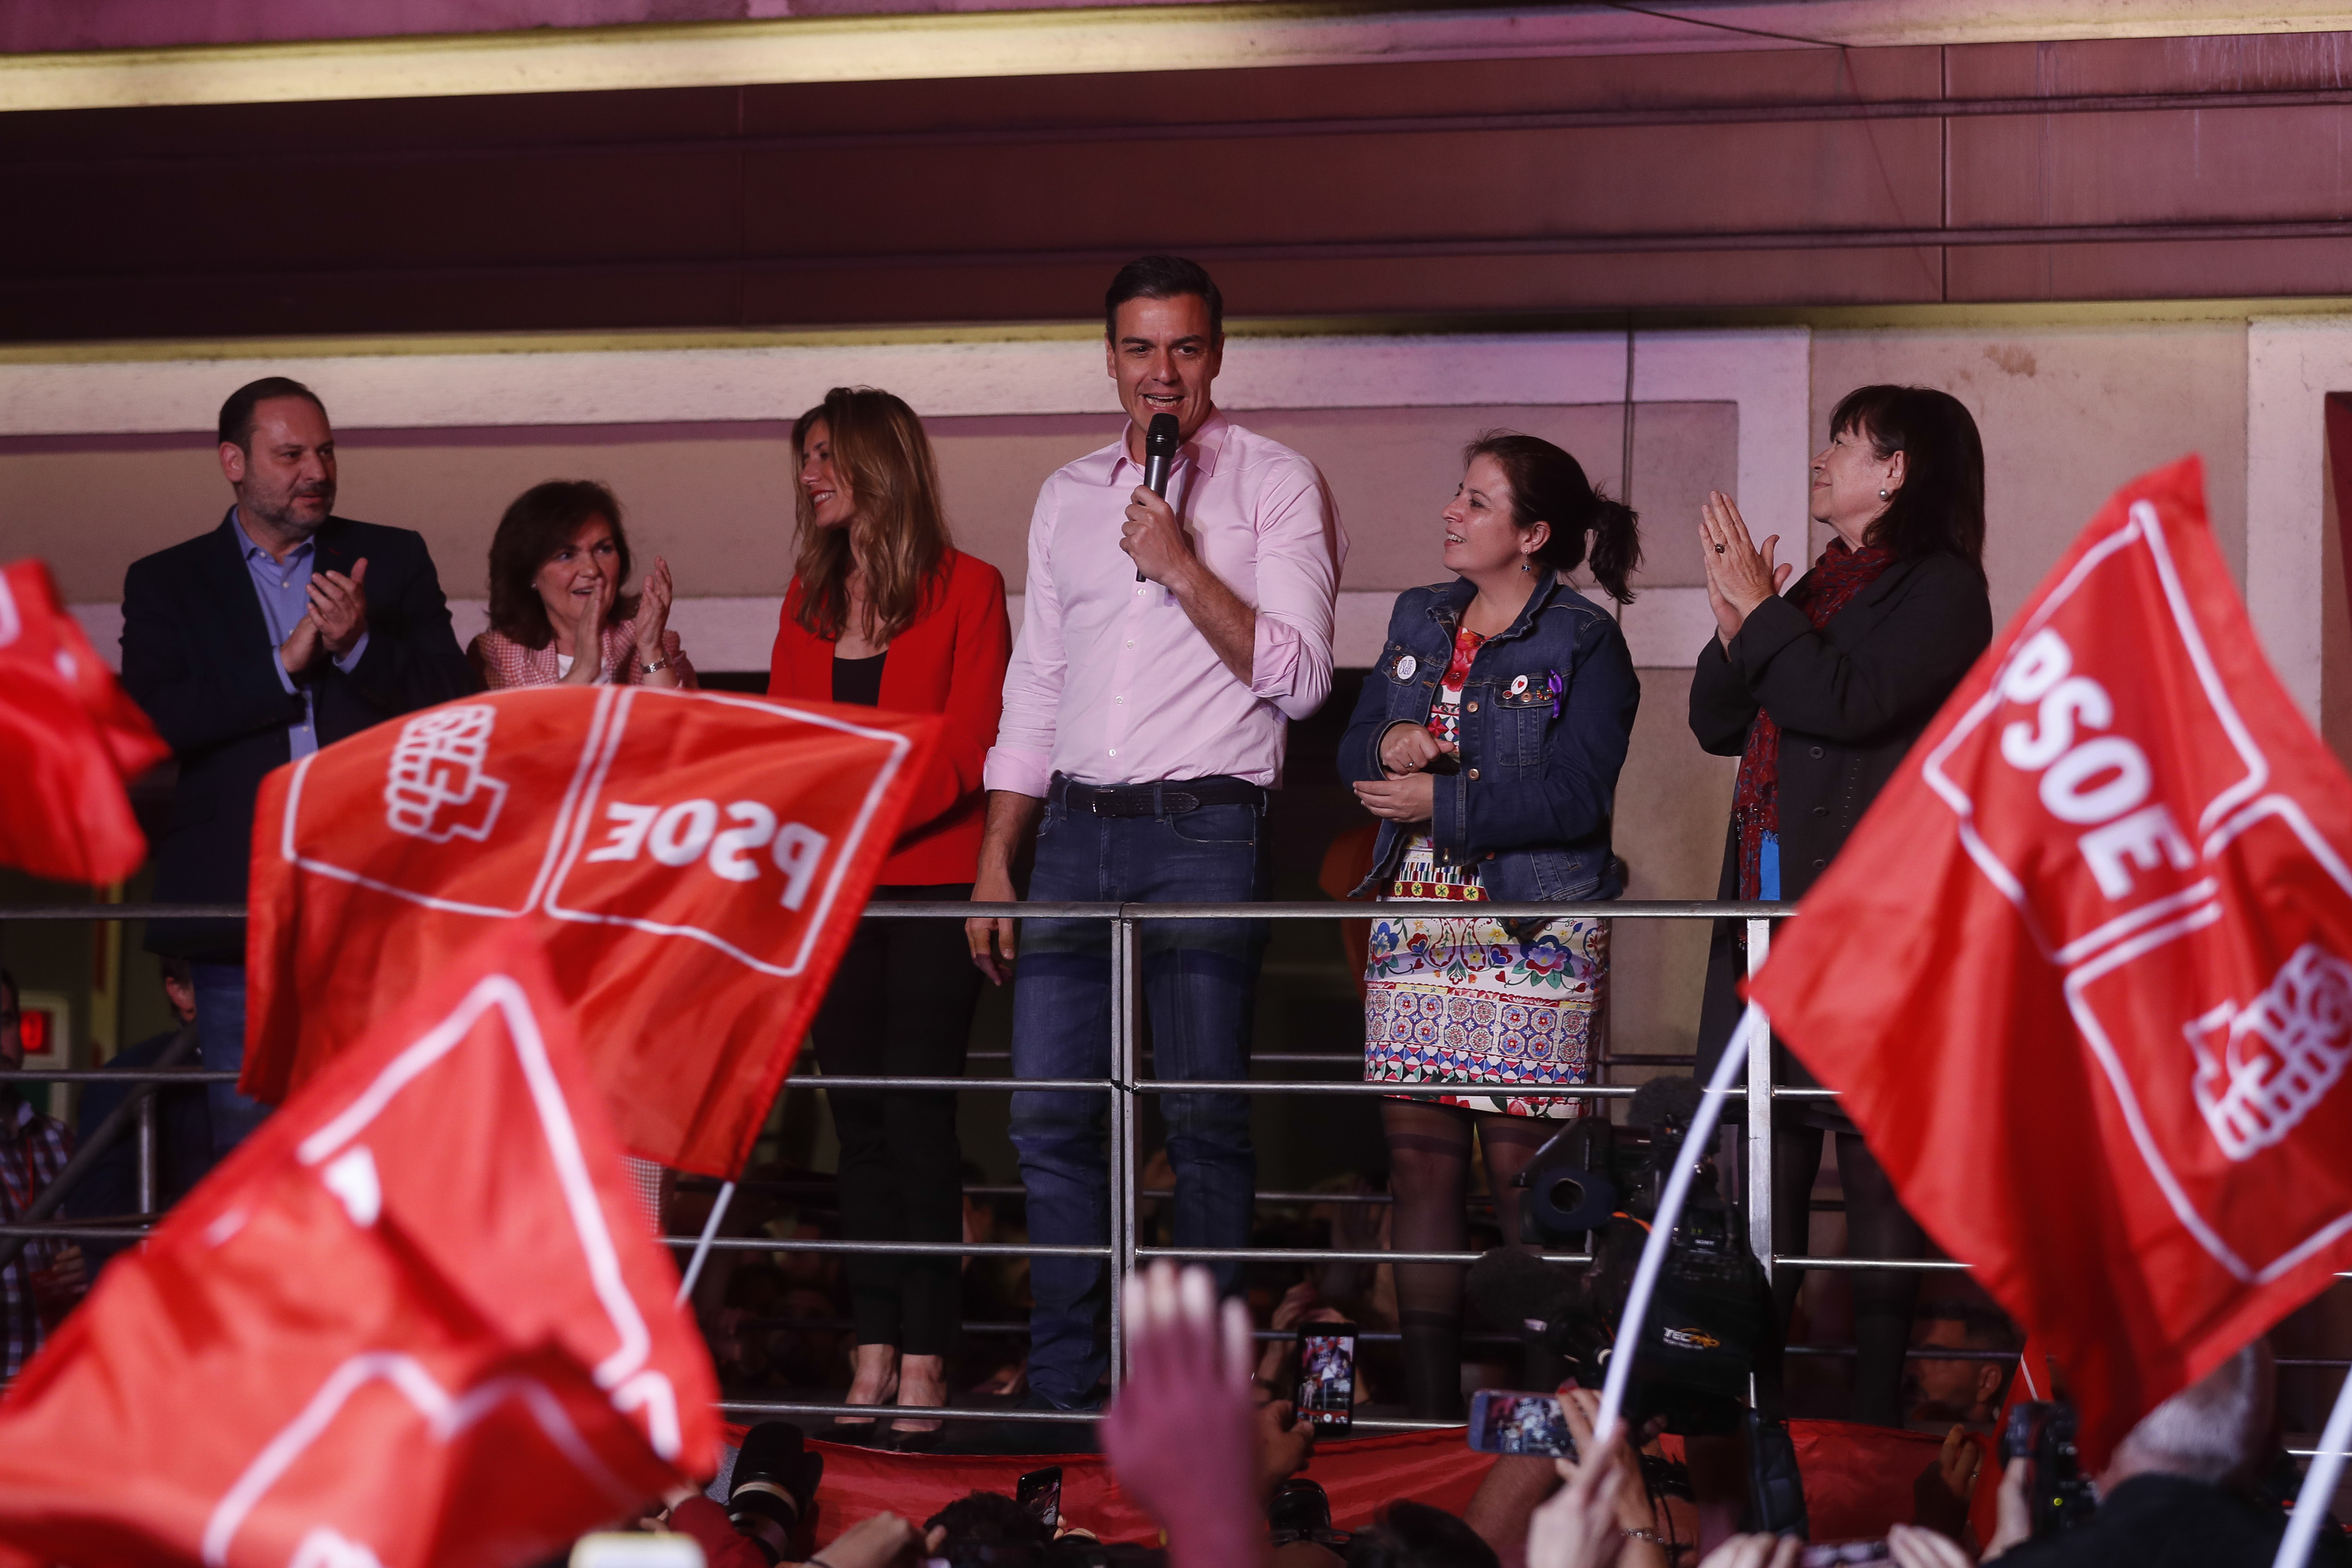 Pedro Sánchez a celebrar a vitória na sede do PSOE / Gtres